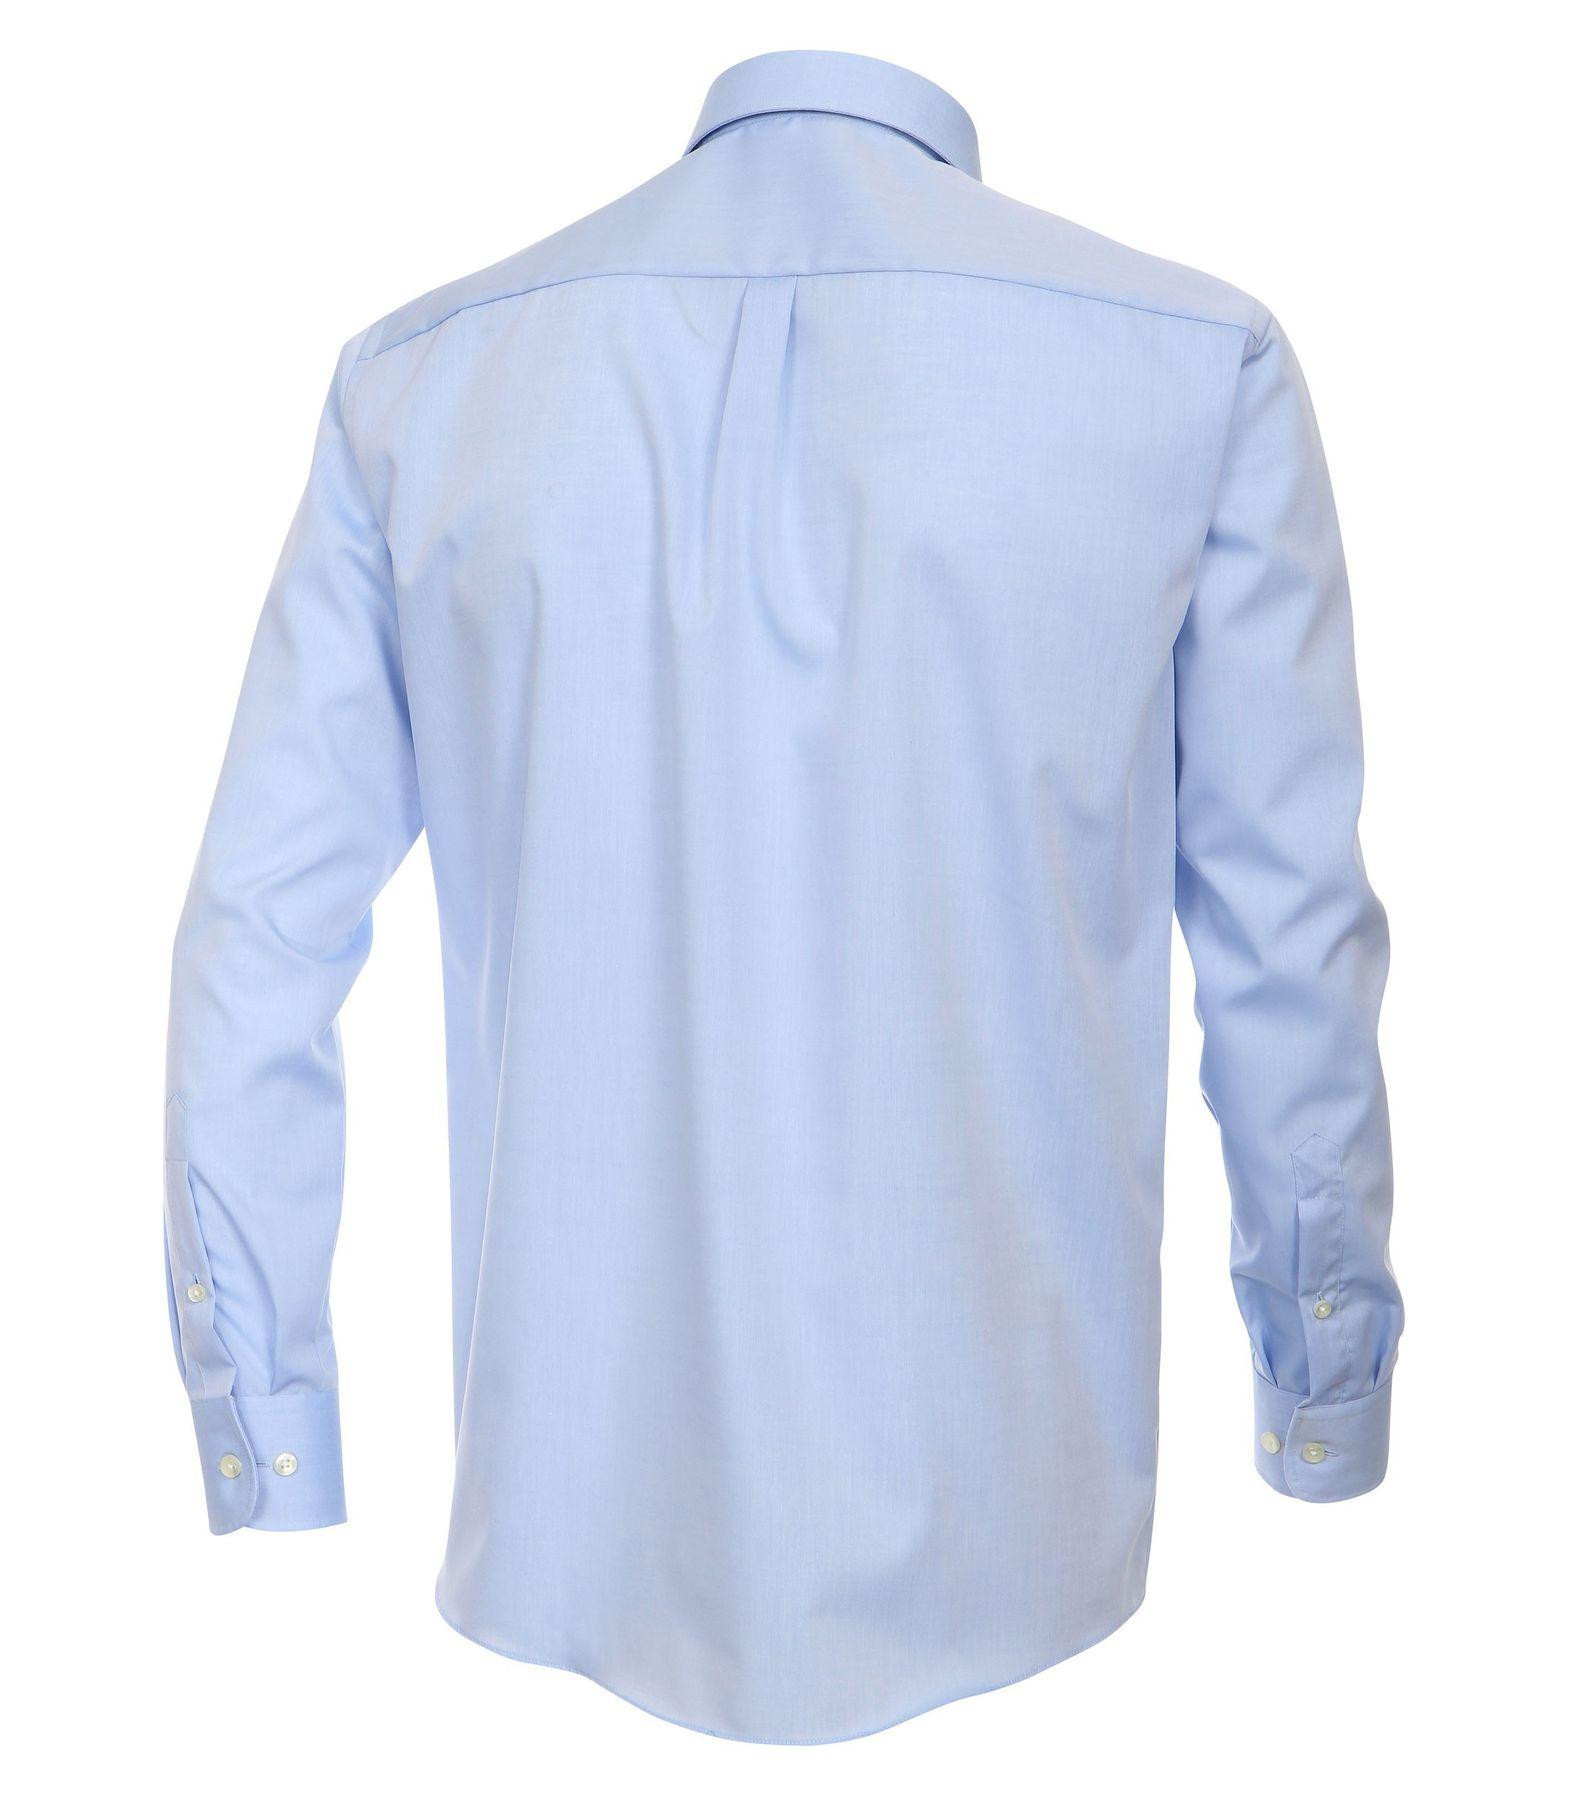 Casa Moda - Comfort Fit - Bügelfreies Herren Business Langarm Hemd verschiedene Farben (006060A) – Bild 6